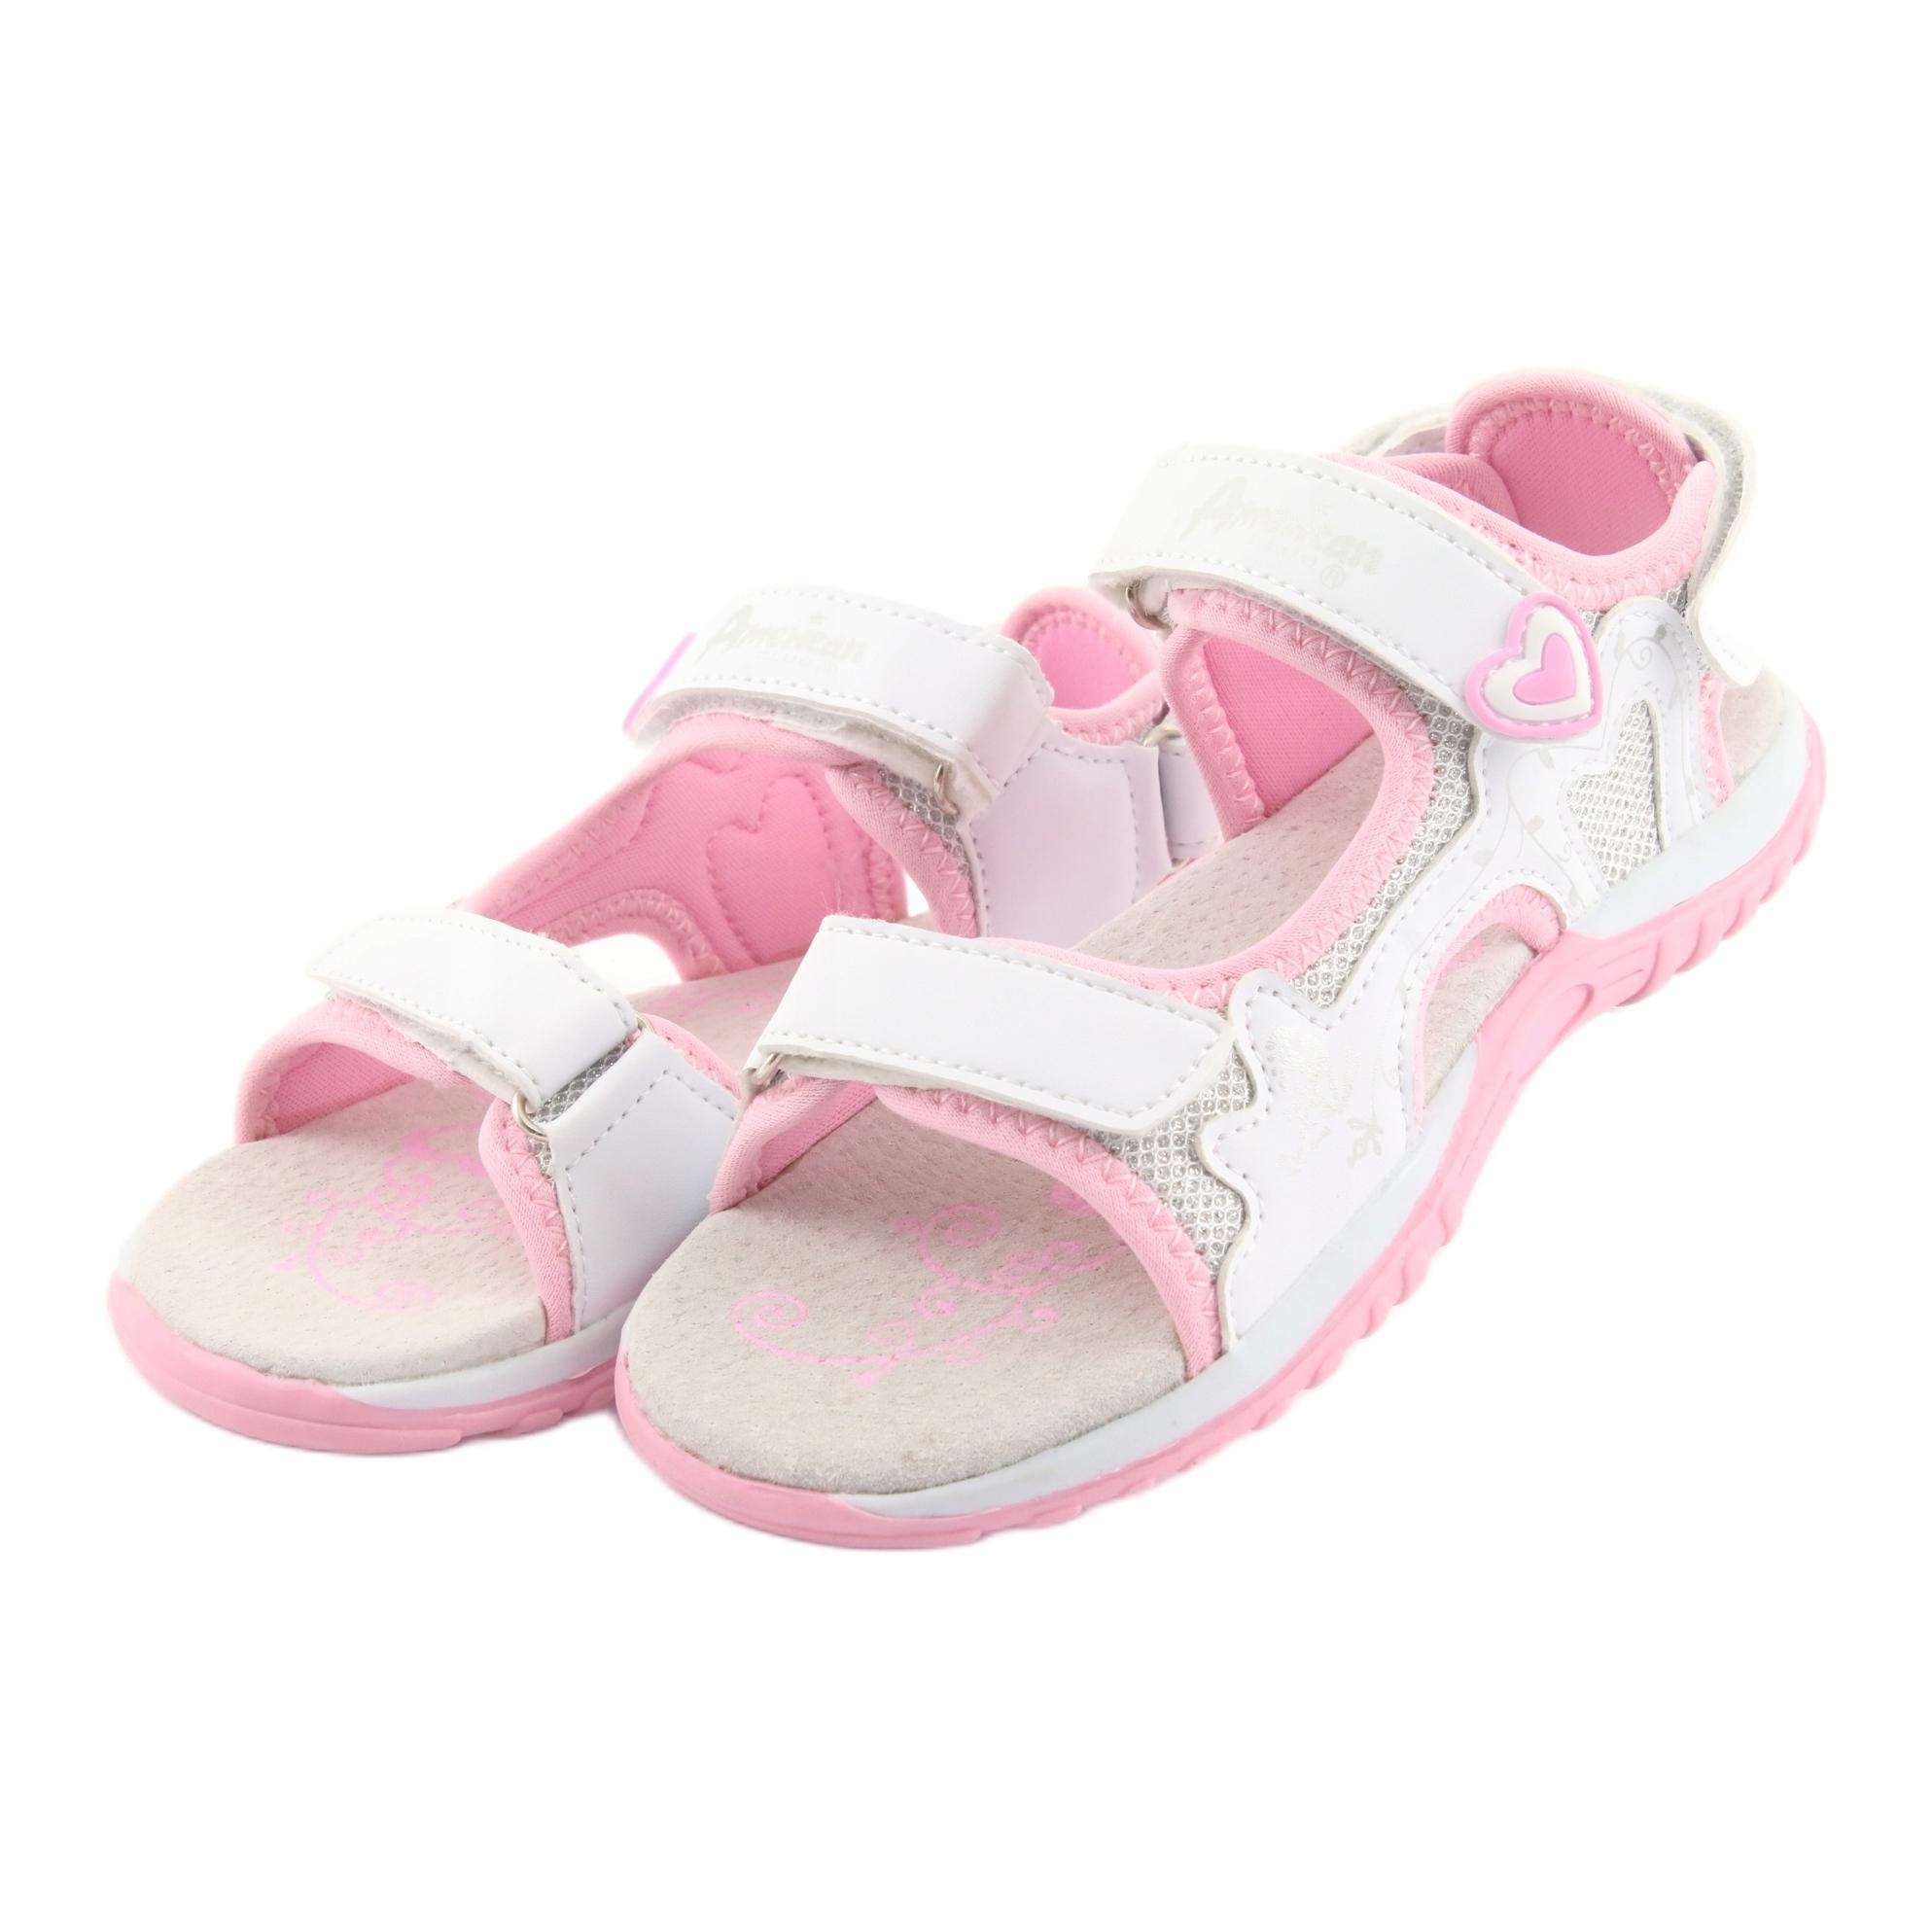 miniatura 4 - Sandali da donna di American Club bianco grigio rosa